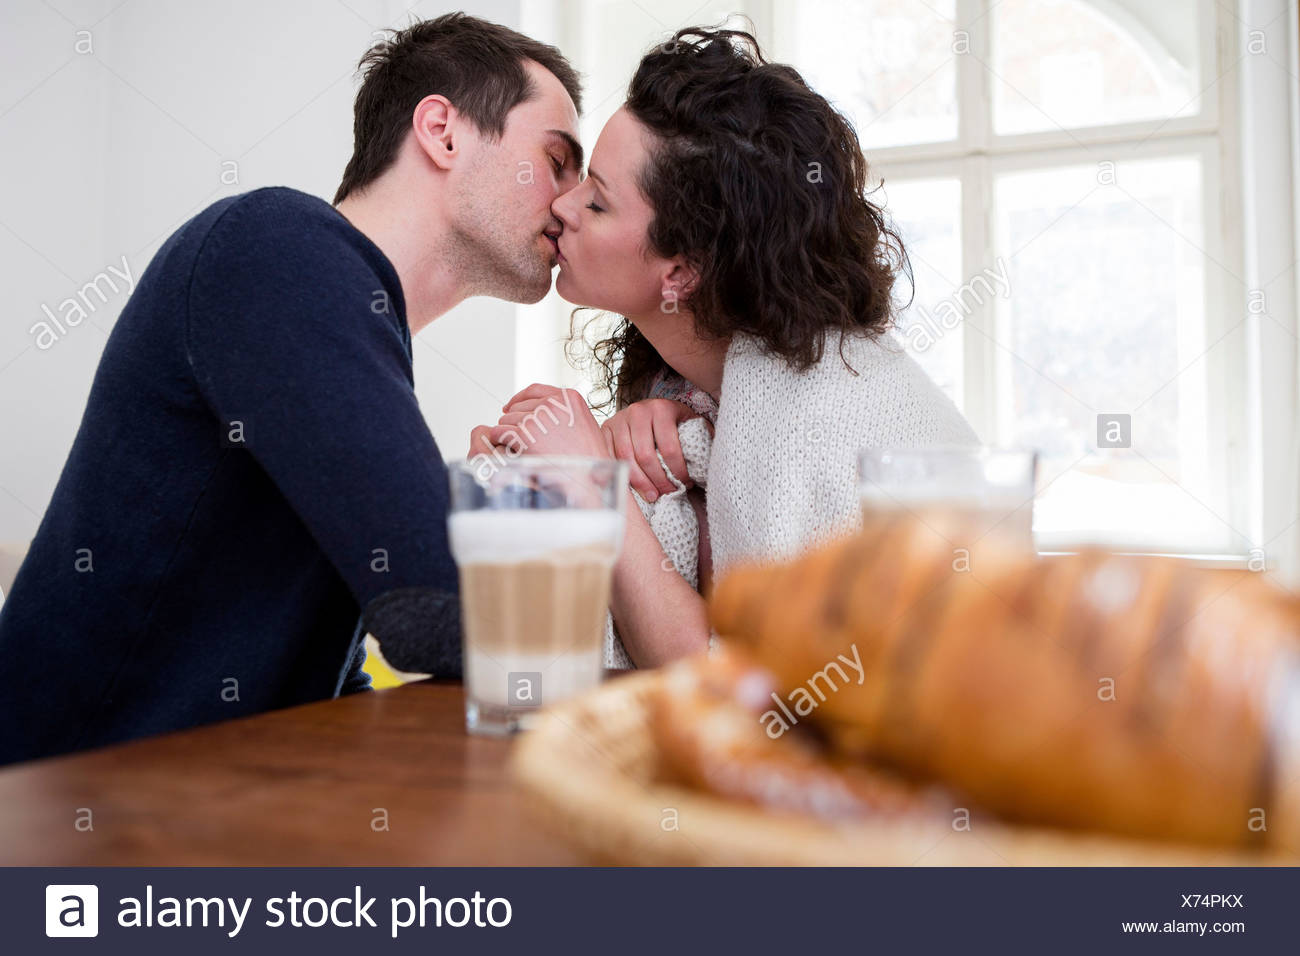 Heterosexual couple kissing at breakfast table - Stock Image